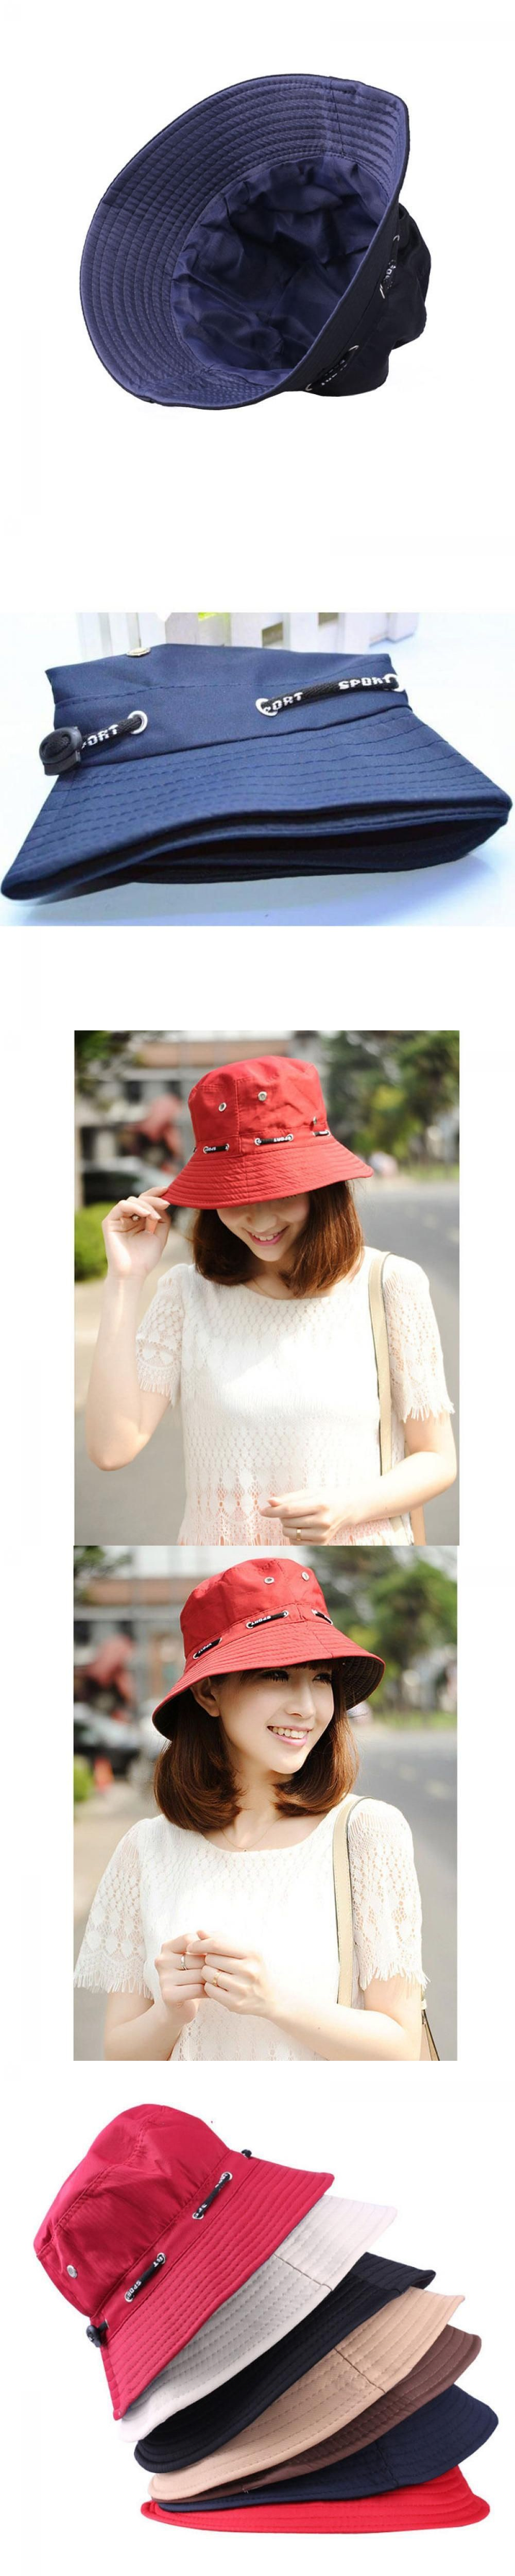 9e368e47e25 1PC Unisex Women Men Bucket Hat Boonie Hunting Fishing Outdoor Cap Men s  Summer Autumn Sun Hats